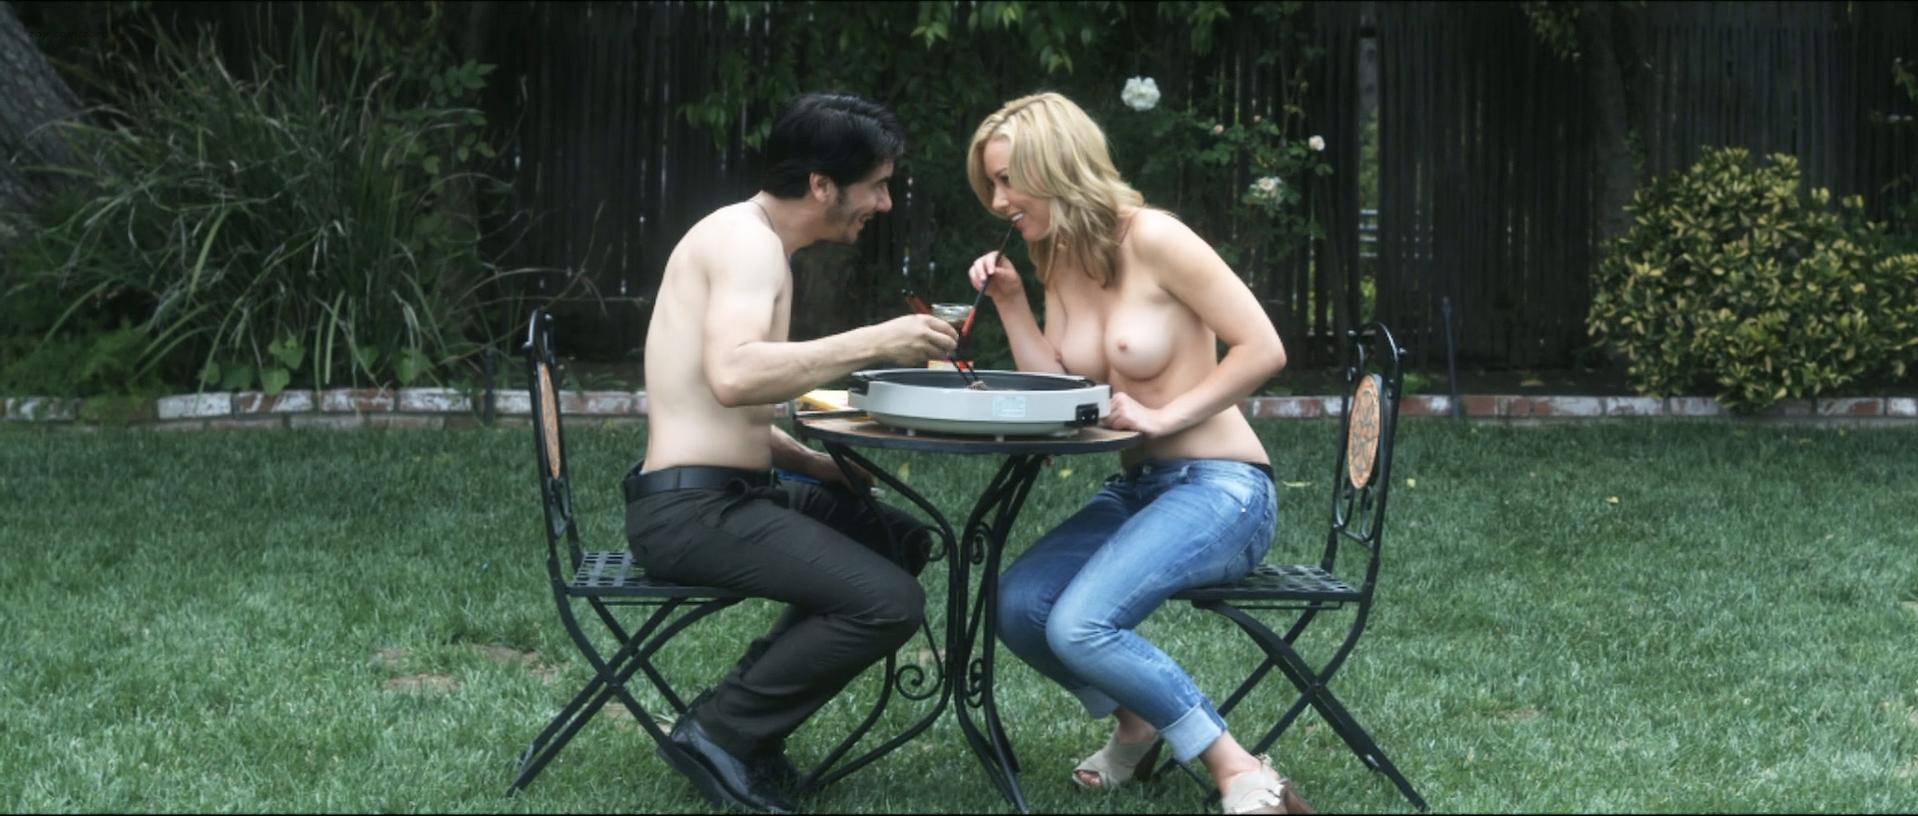 Kayden Kross nude, Nicole D'Angelo nude, Elana Krausz nude, Paula Labaredas nude, Pollyanna McIntosh sexy - Blue Dream (2013)